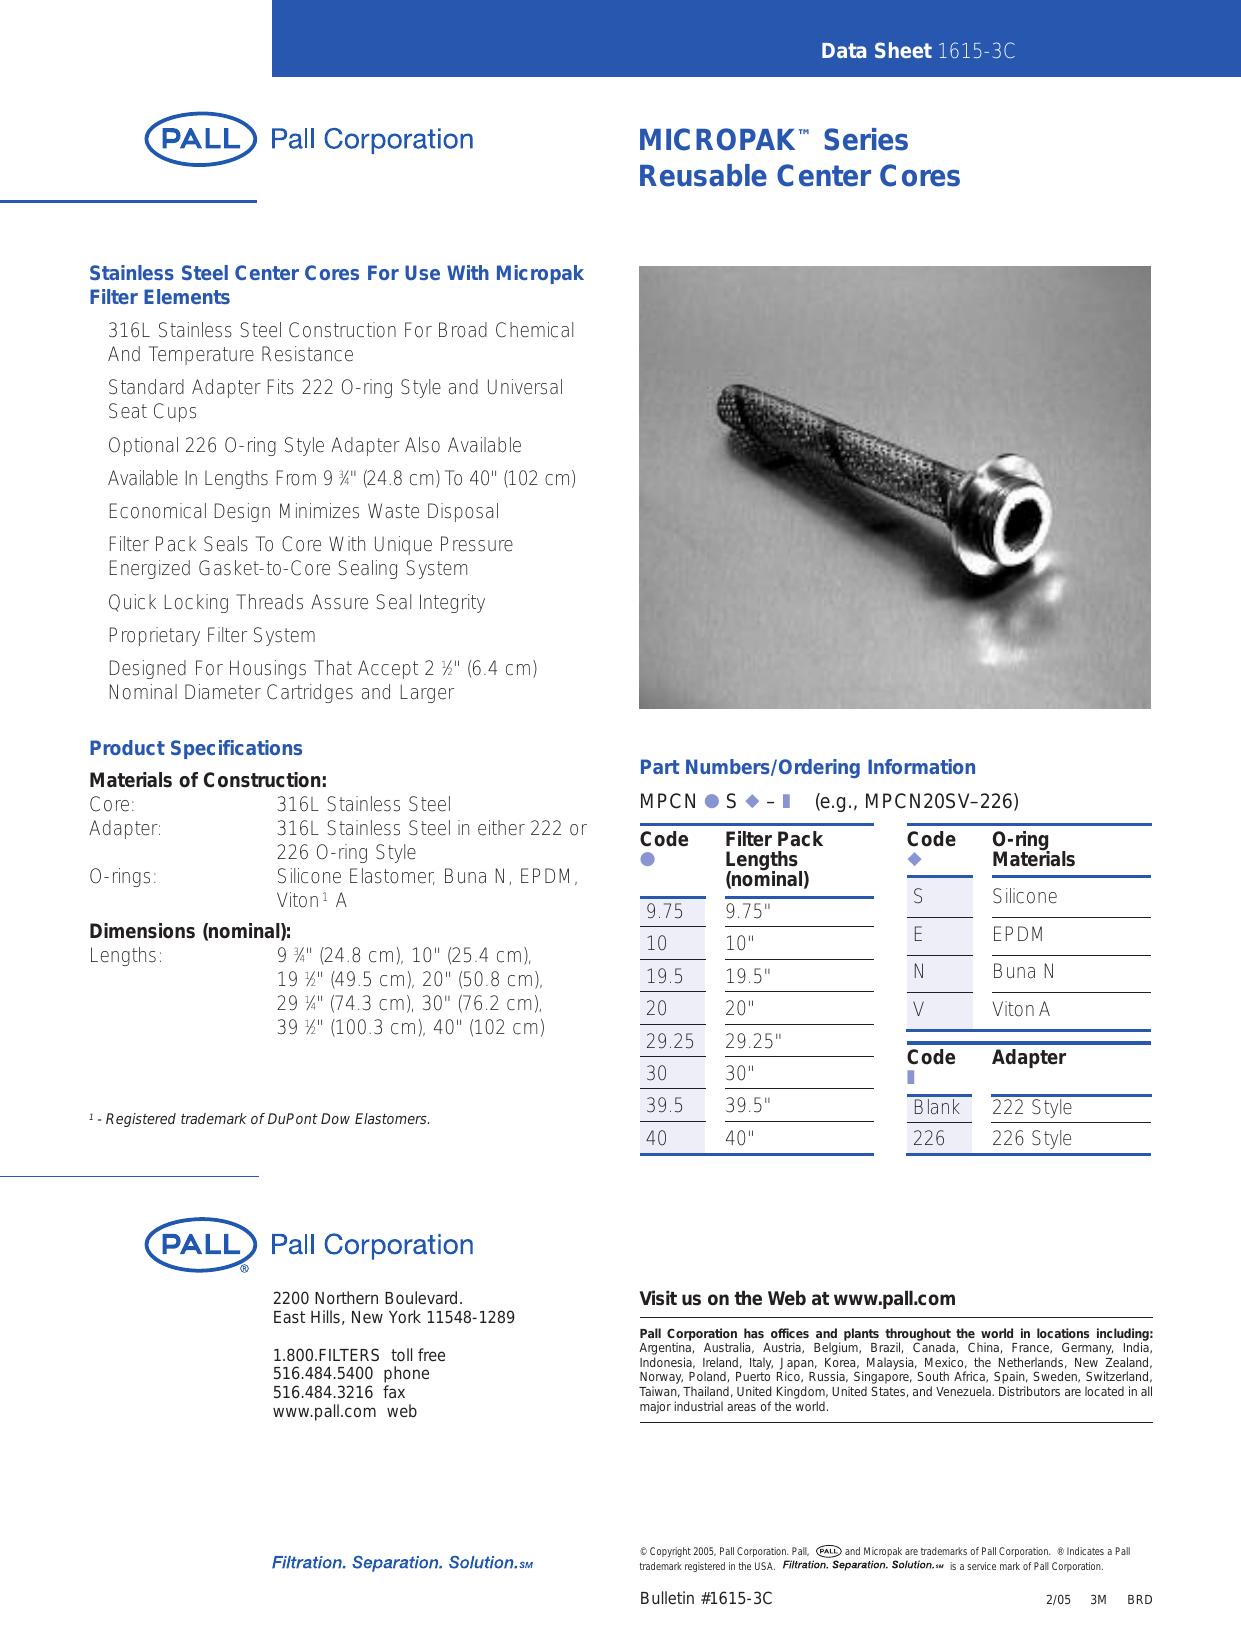 Micropak Series Reusable Center Cores Data Sheet